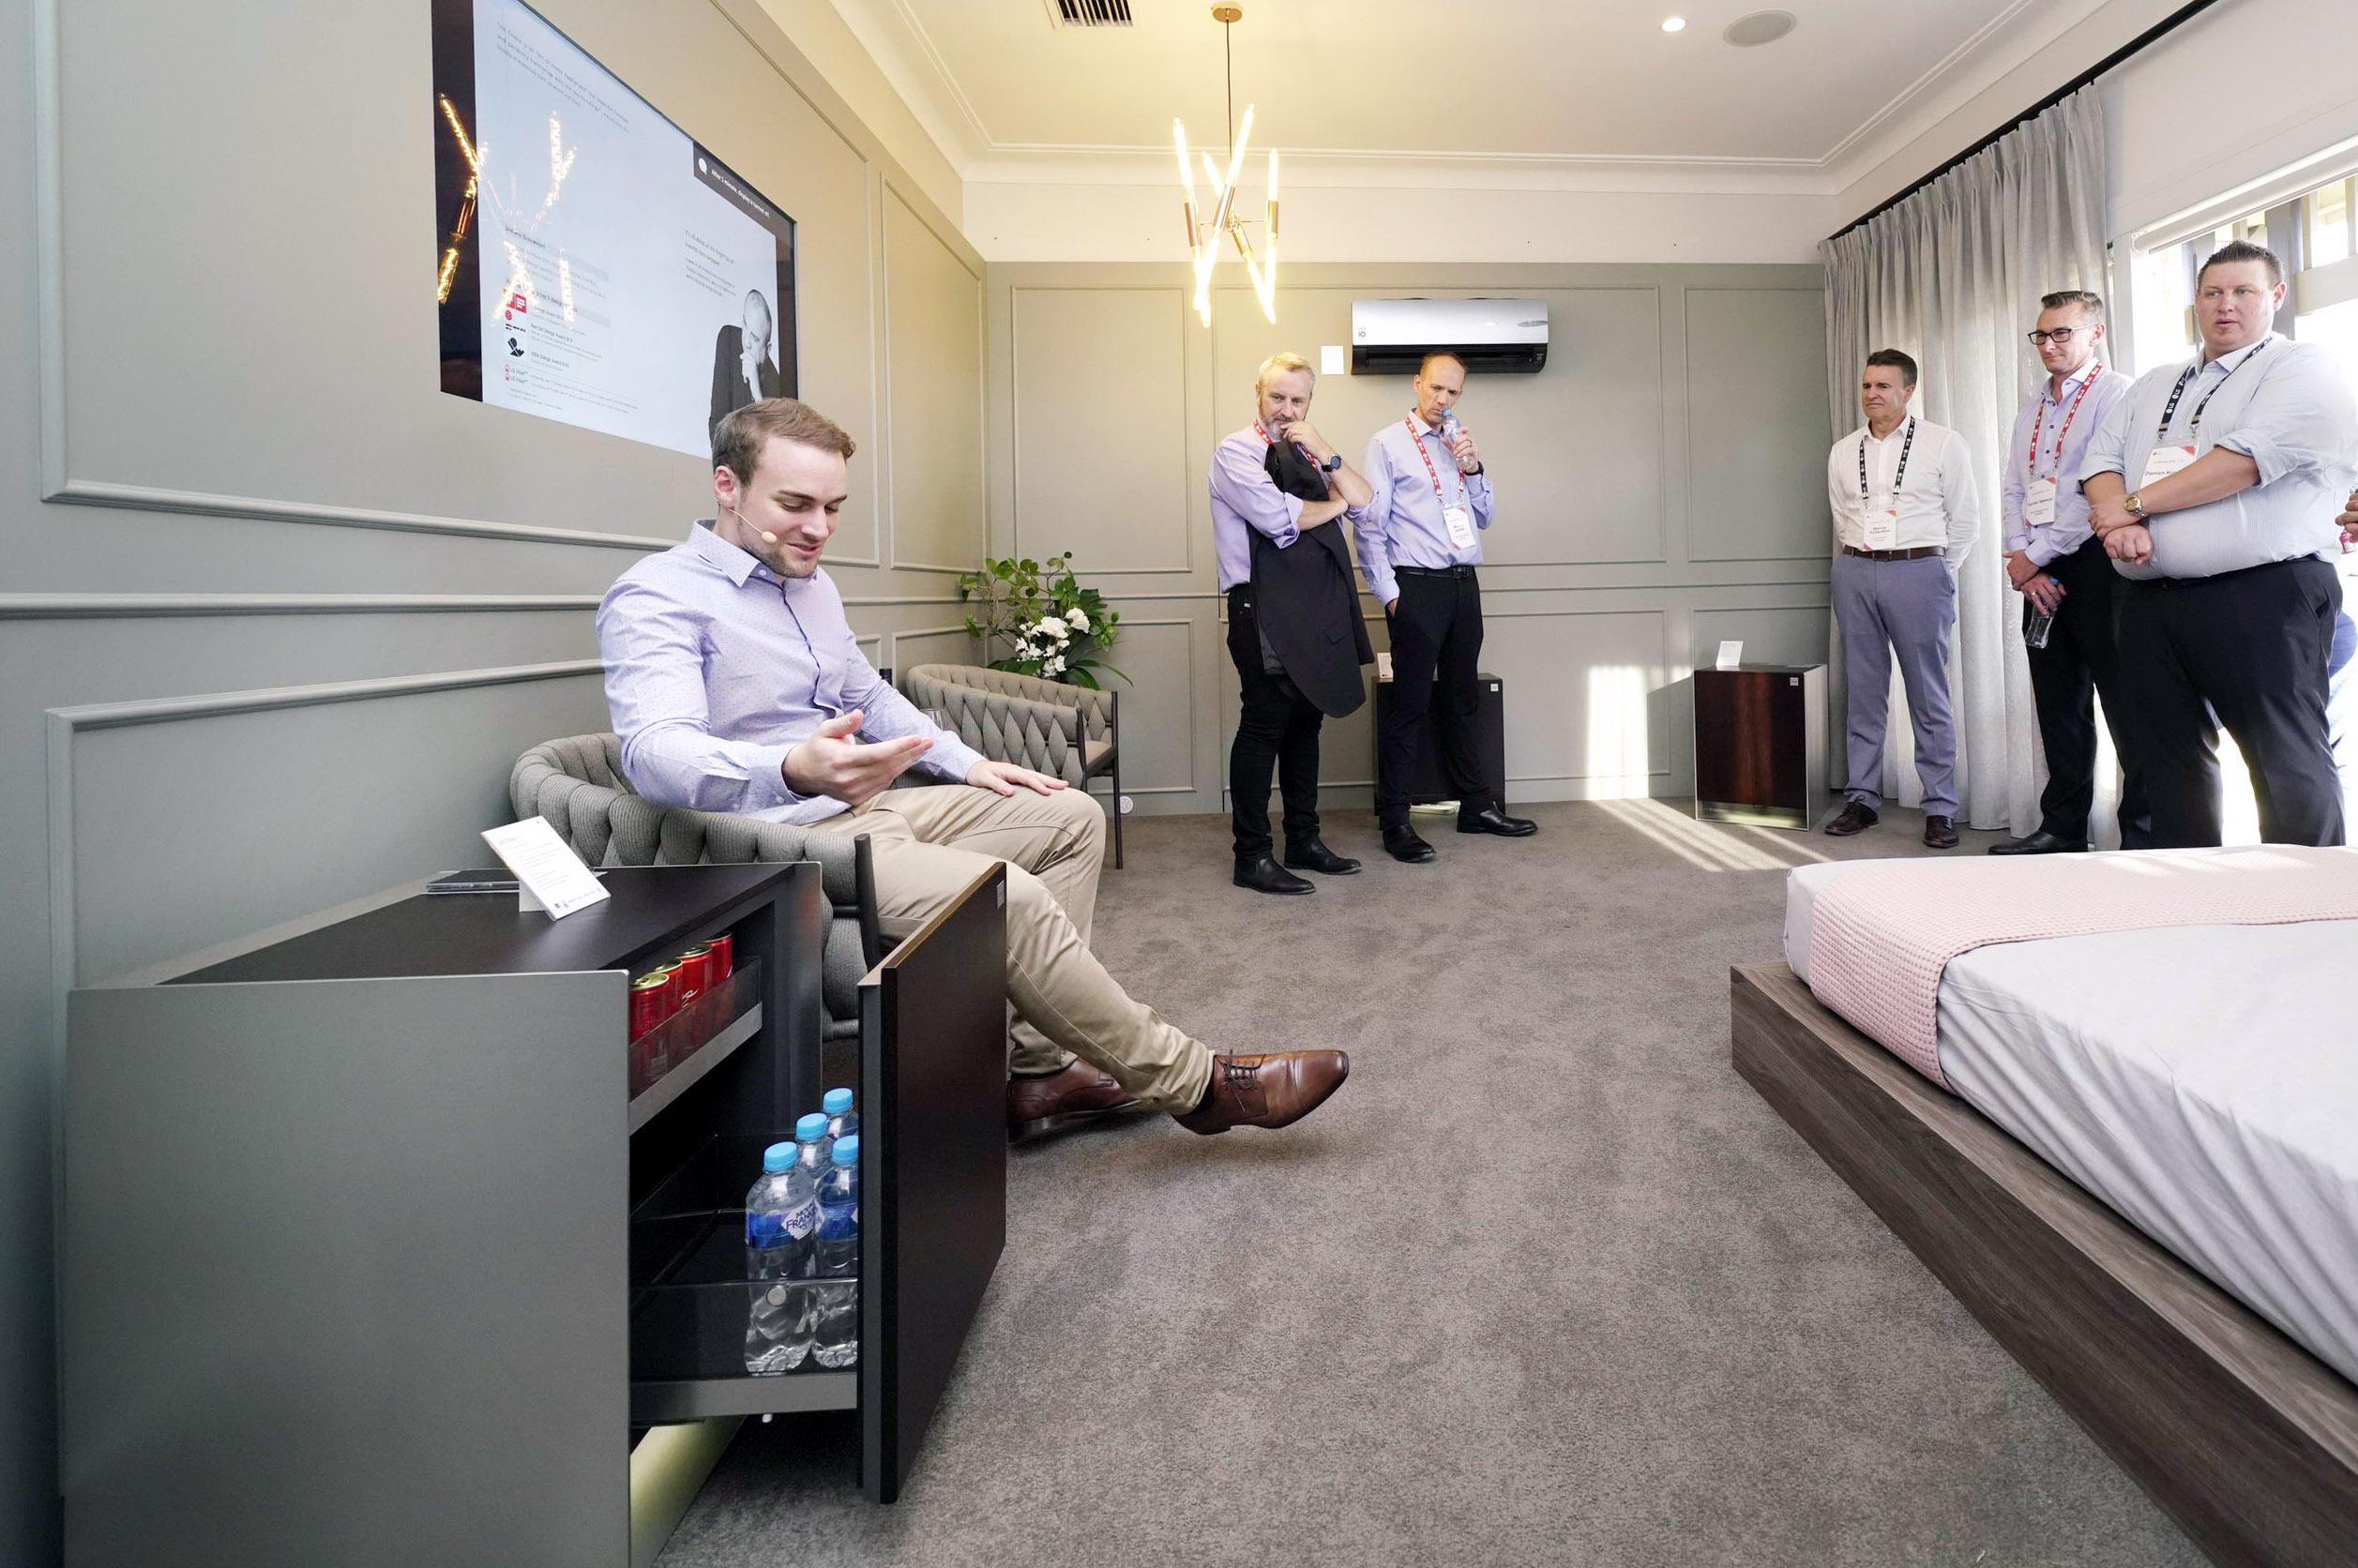 LG전자가 12일부터 이틀간 호주 시드니에서 올해 첫 'LG 이노페스트(LG InnoFest)'를 열었다. LG전자는 시드니 근교의 일반 주택을 'LG 홈(LG Home)'으로 꾸며 고객들이 실제 주거공간에서 제품을 직접 경험할 수 있도록 했다. LG 이노페스트 참가자들이 침실에서 프리미엄 프라이빗 가전 'LG 오브제'를 체험하고 있다.